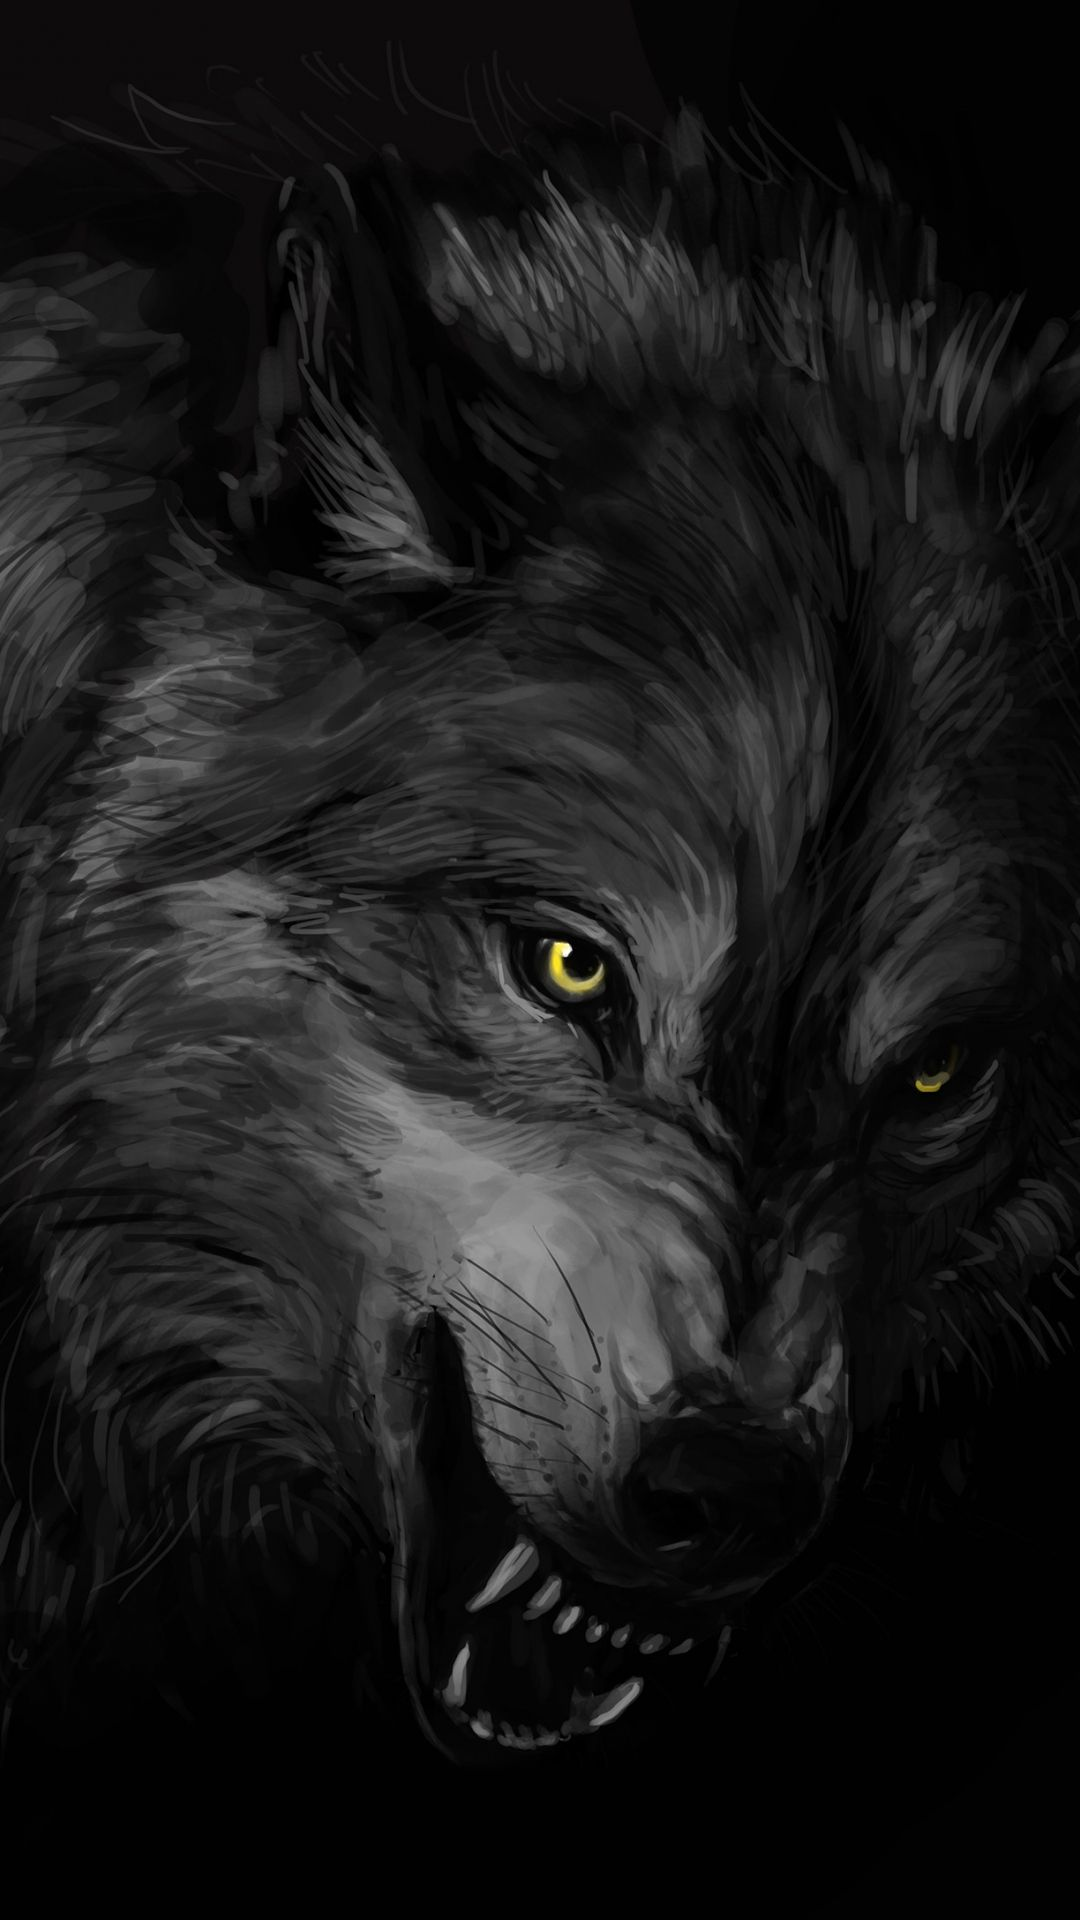 Spirit Wolf Iphone Background En 2020 Tatuajes De Lobos Lobos Animales Lobo Fantasia